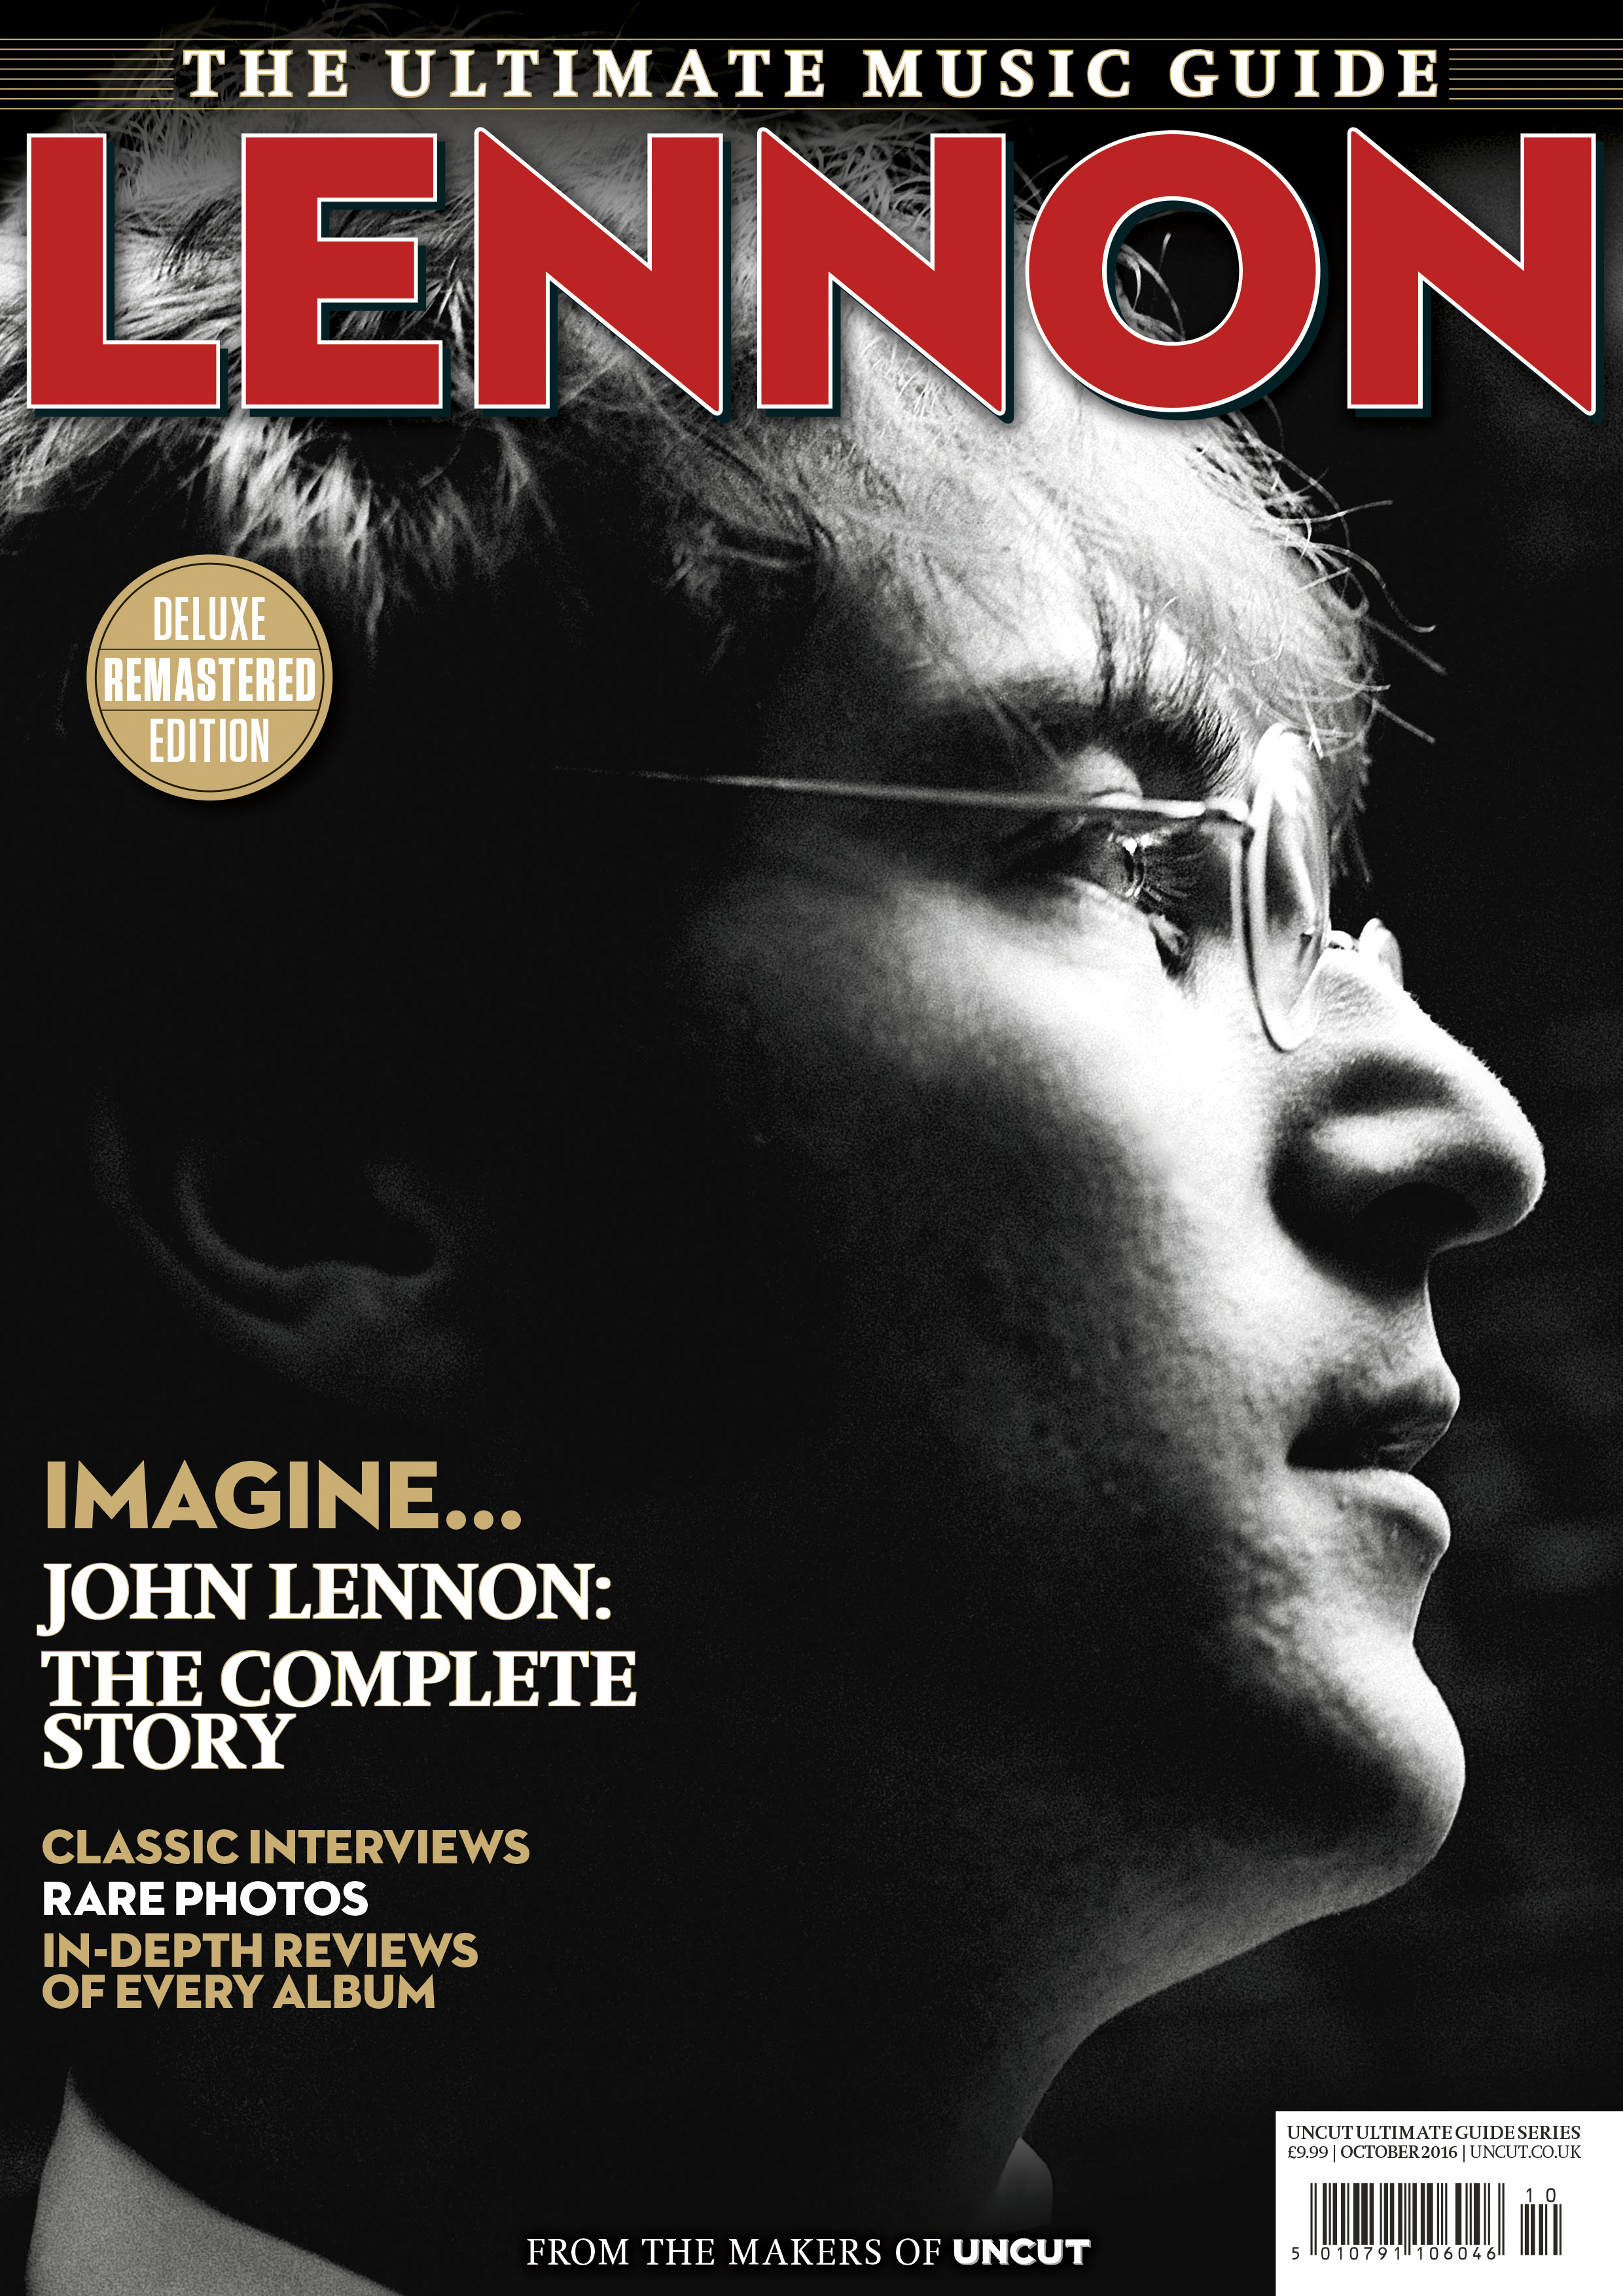 Bildresultat för the ultimate music guide john lennon